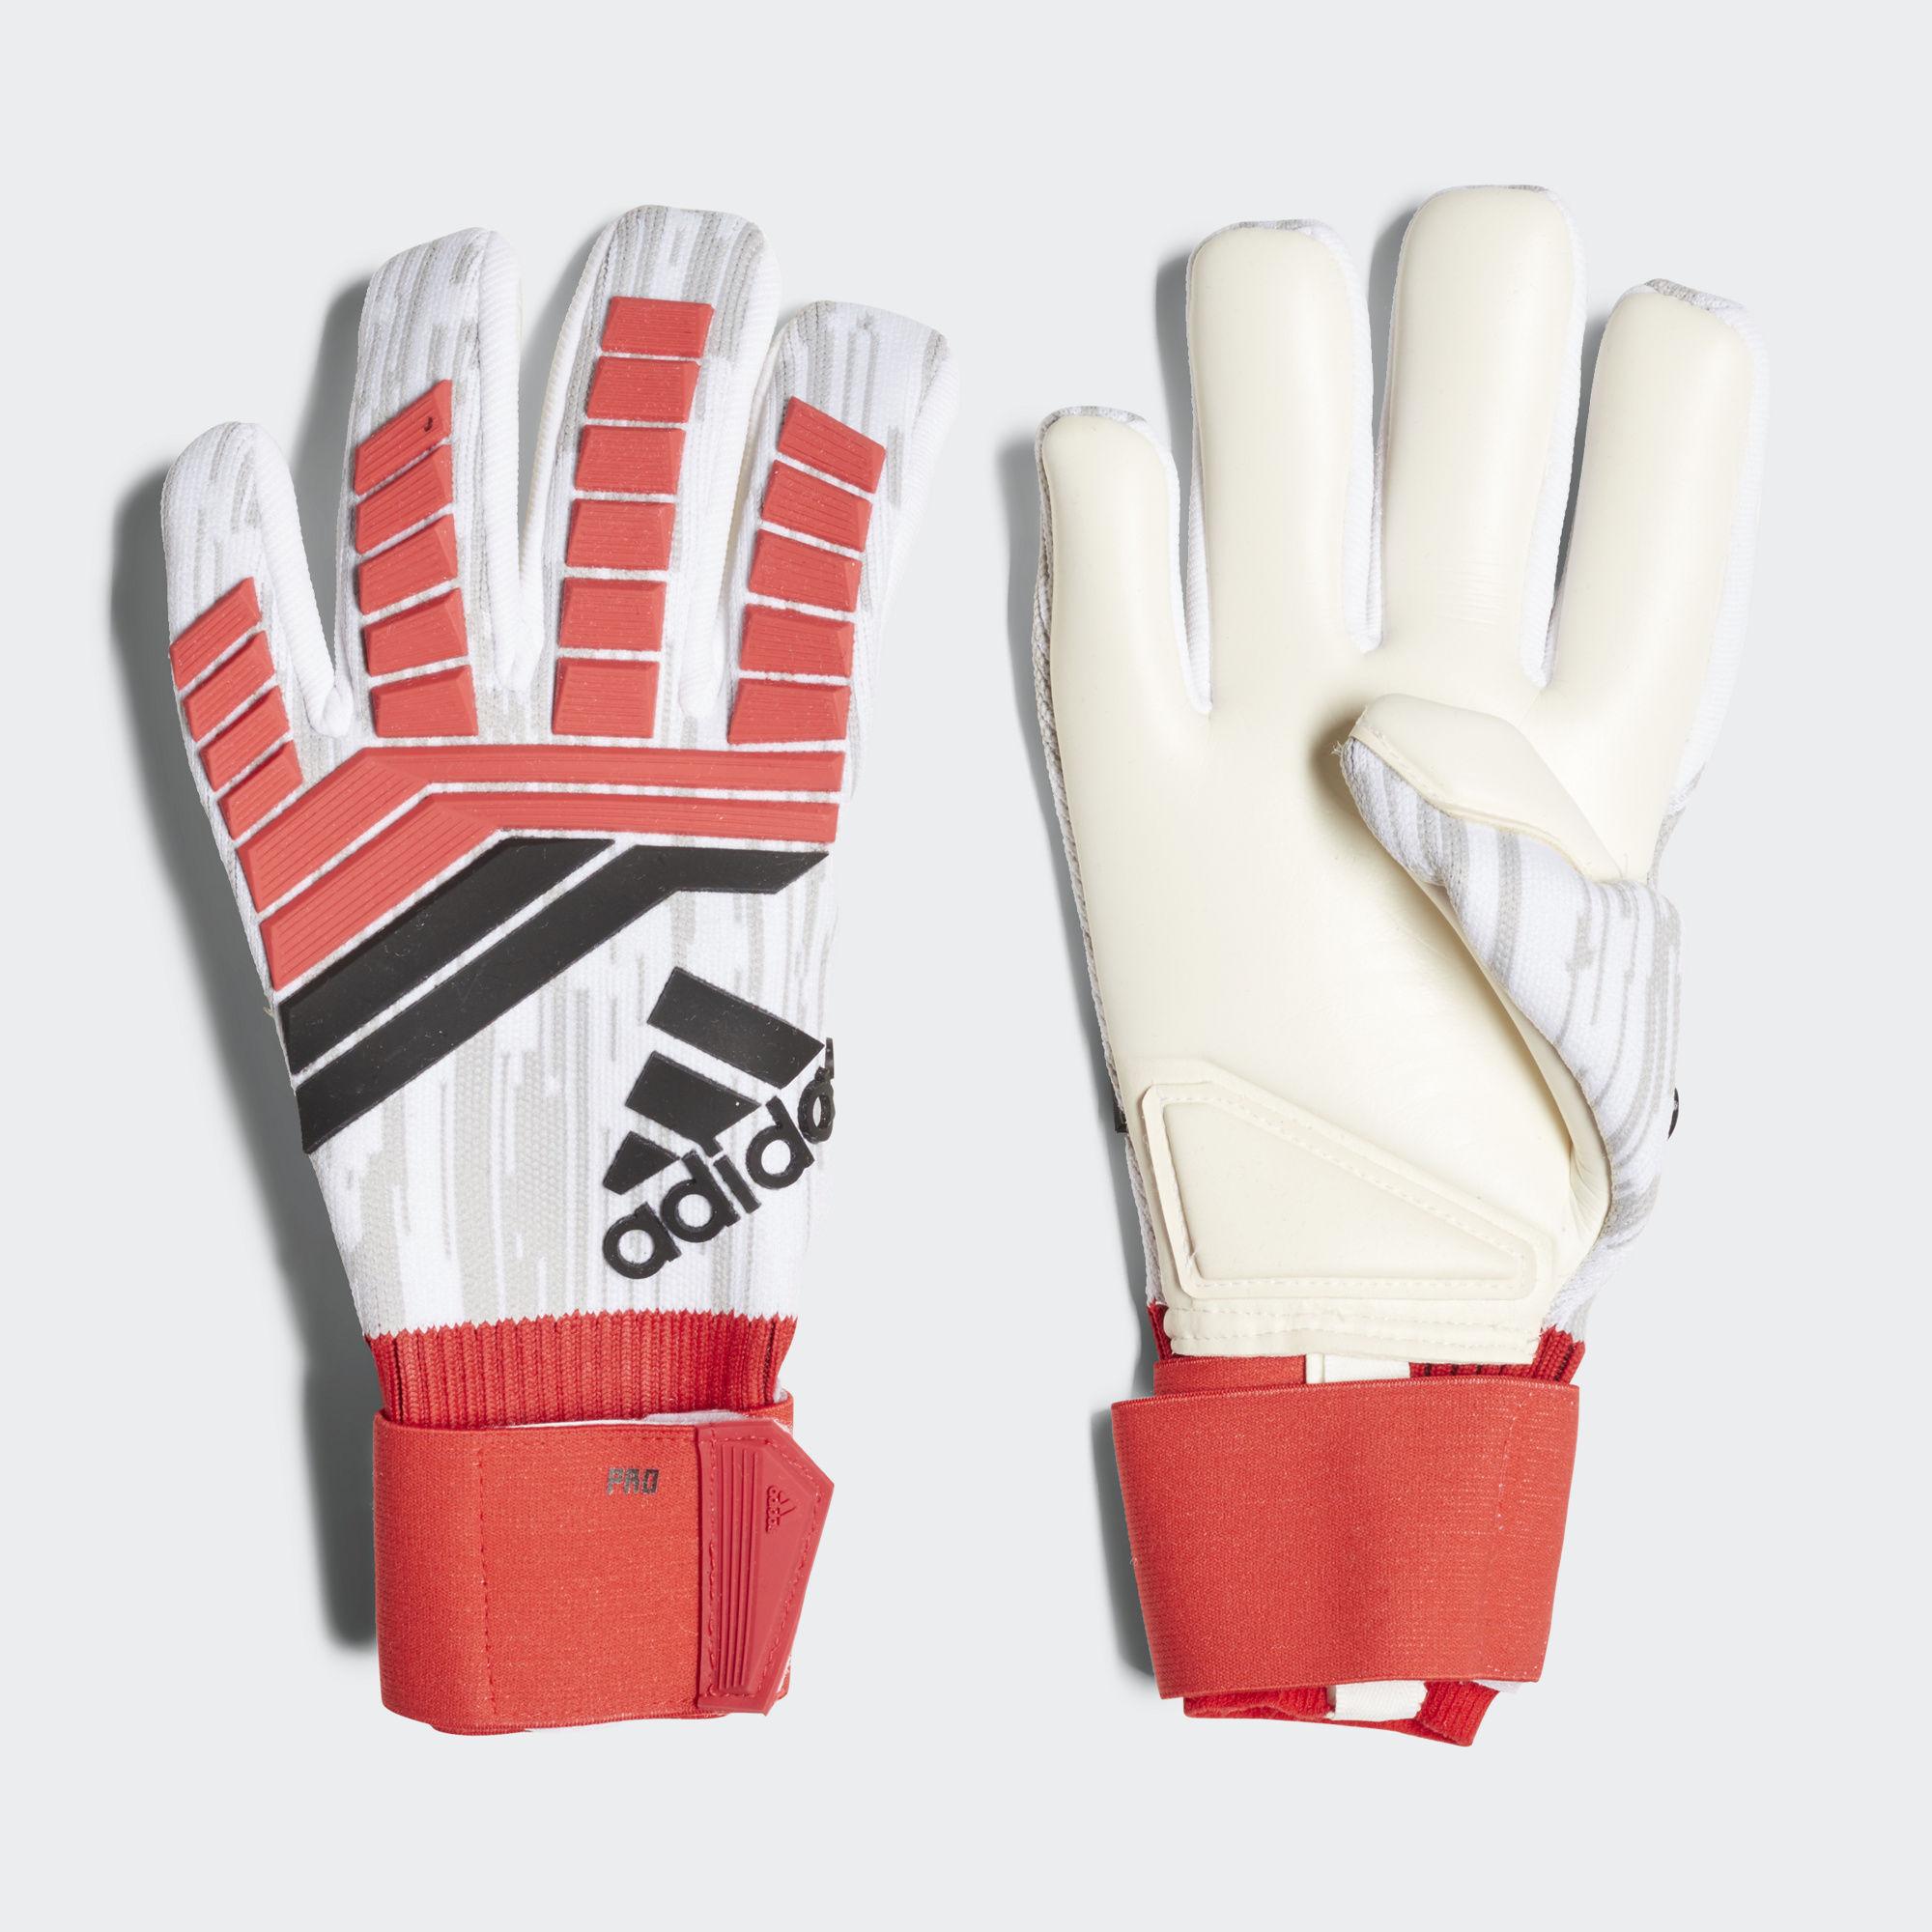 Вратарские перчатки Predator 18 Pro CF1352 adidas Performance - Украина  2970266f3551d